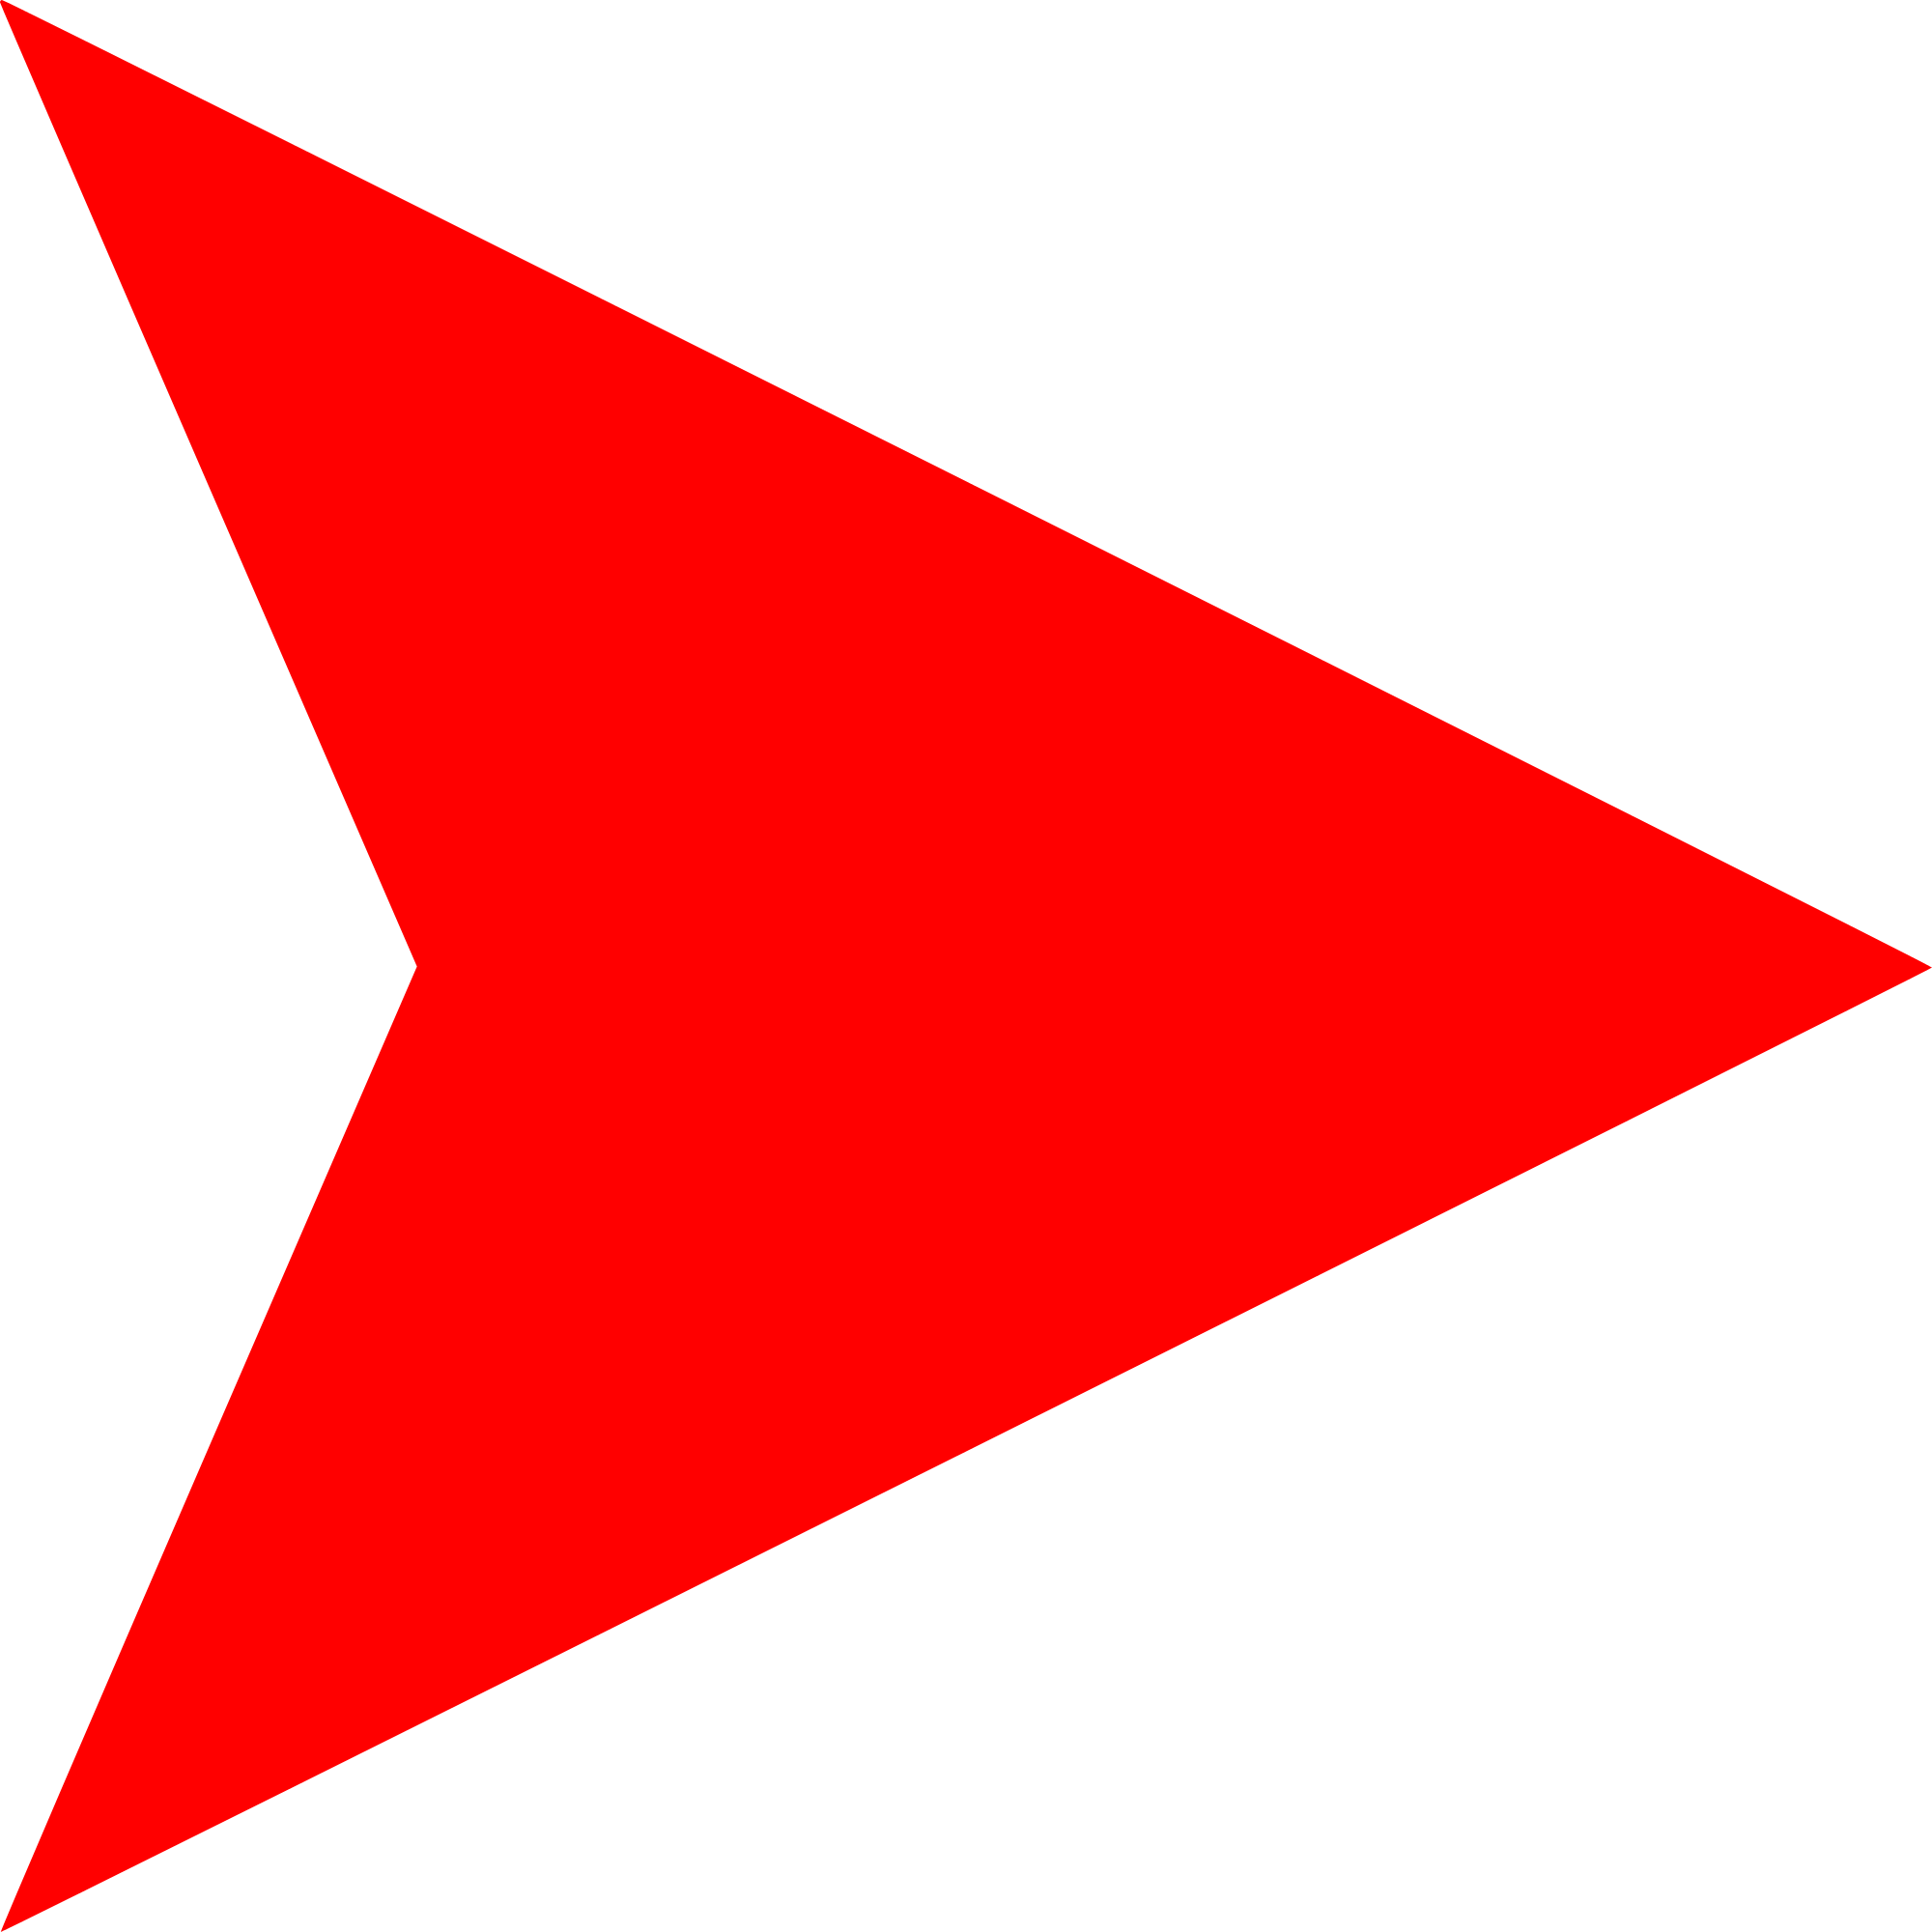 Download Red Arrow Right Png Clipart Arrow Clip Art ...